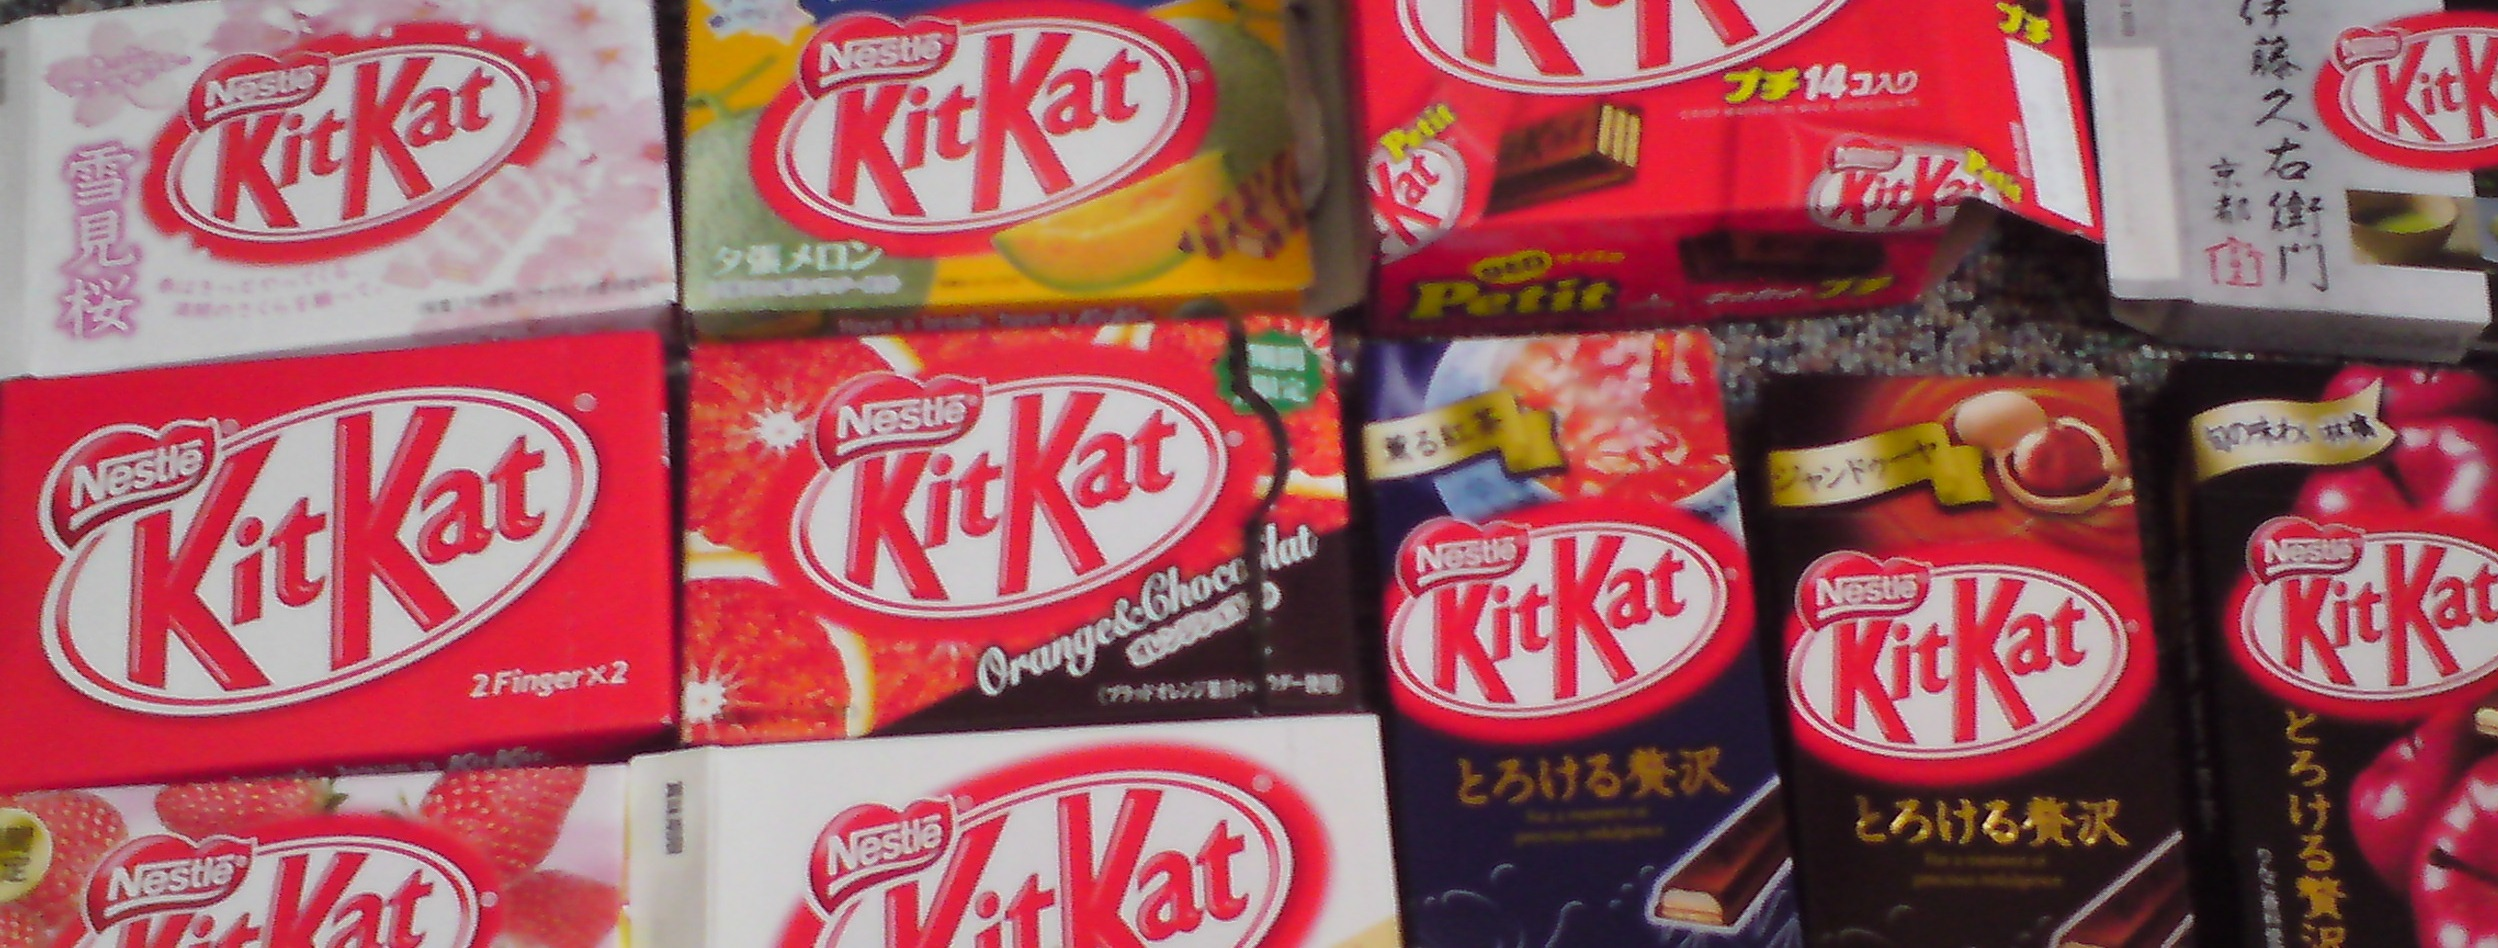 KitKat Android Adoption Remains Below 2%